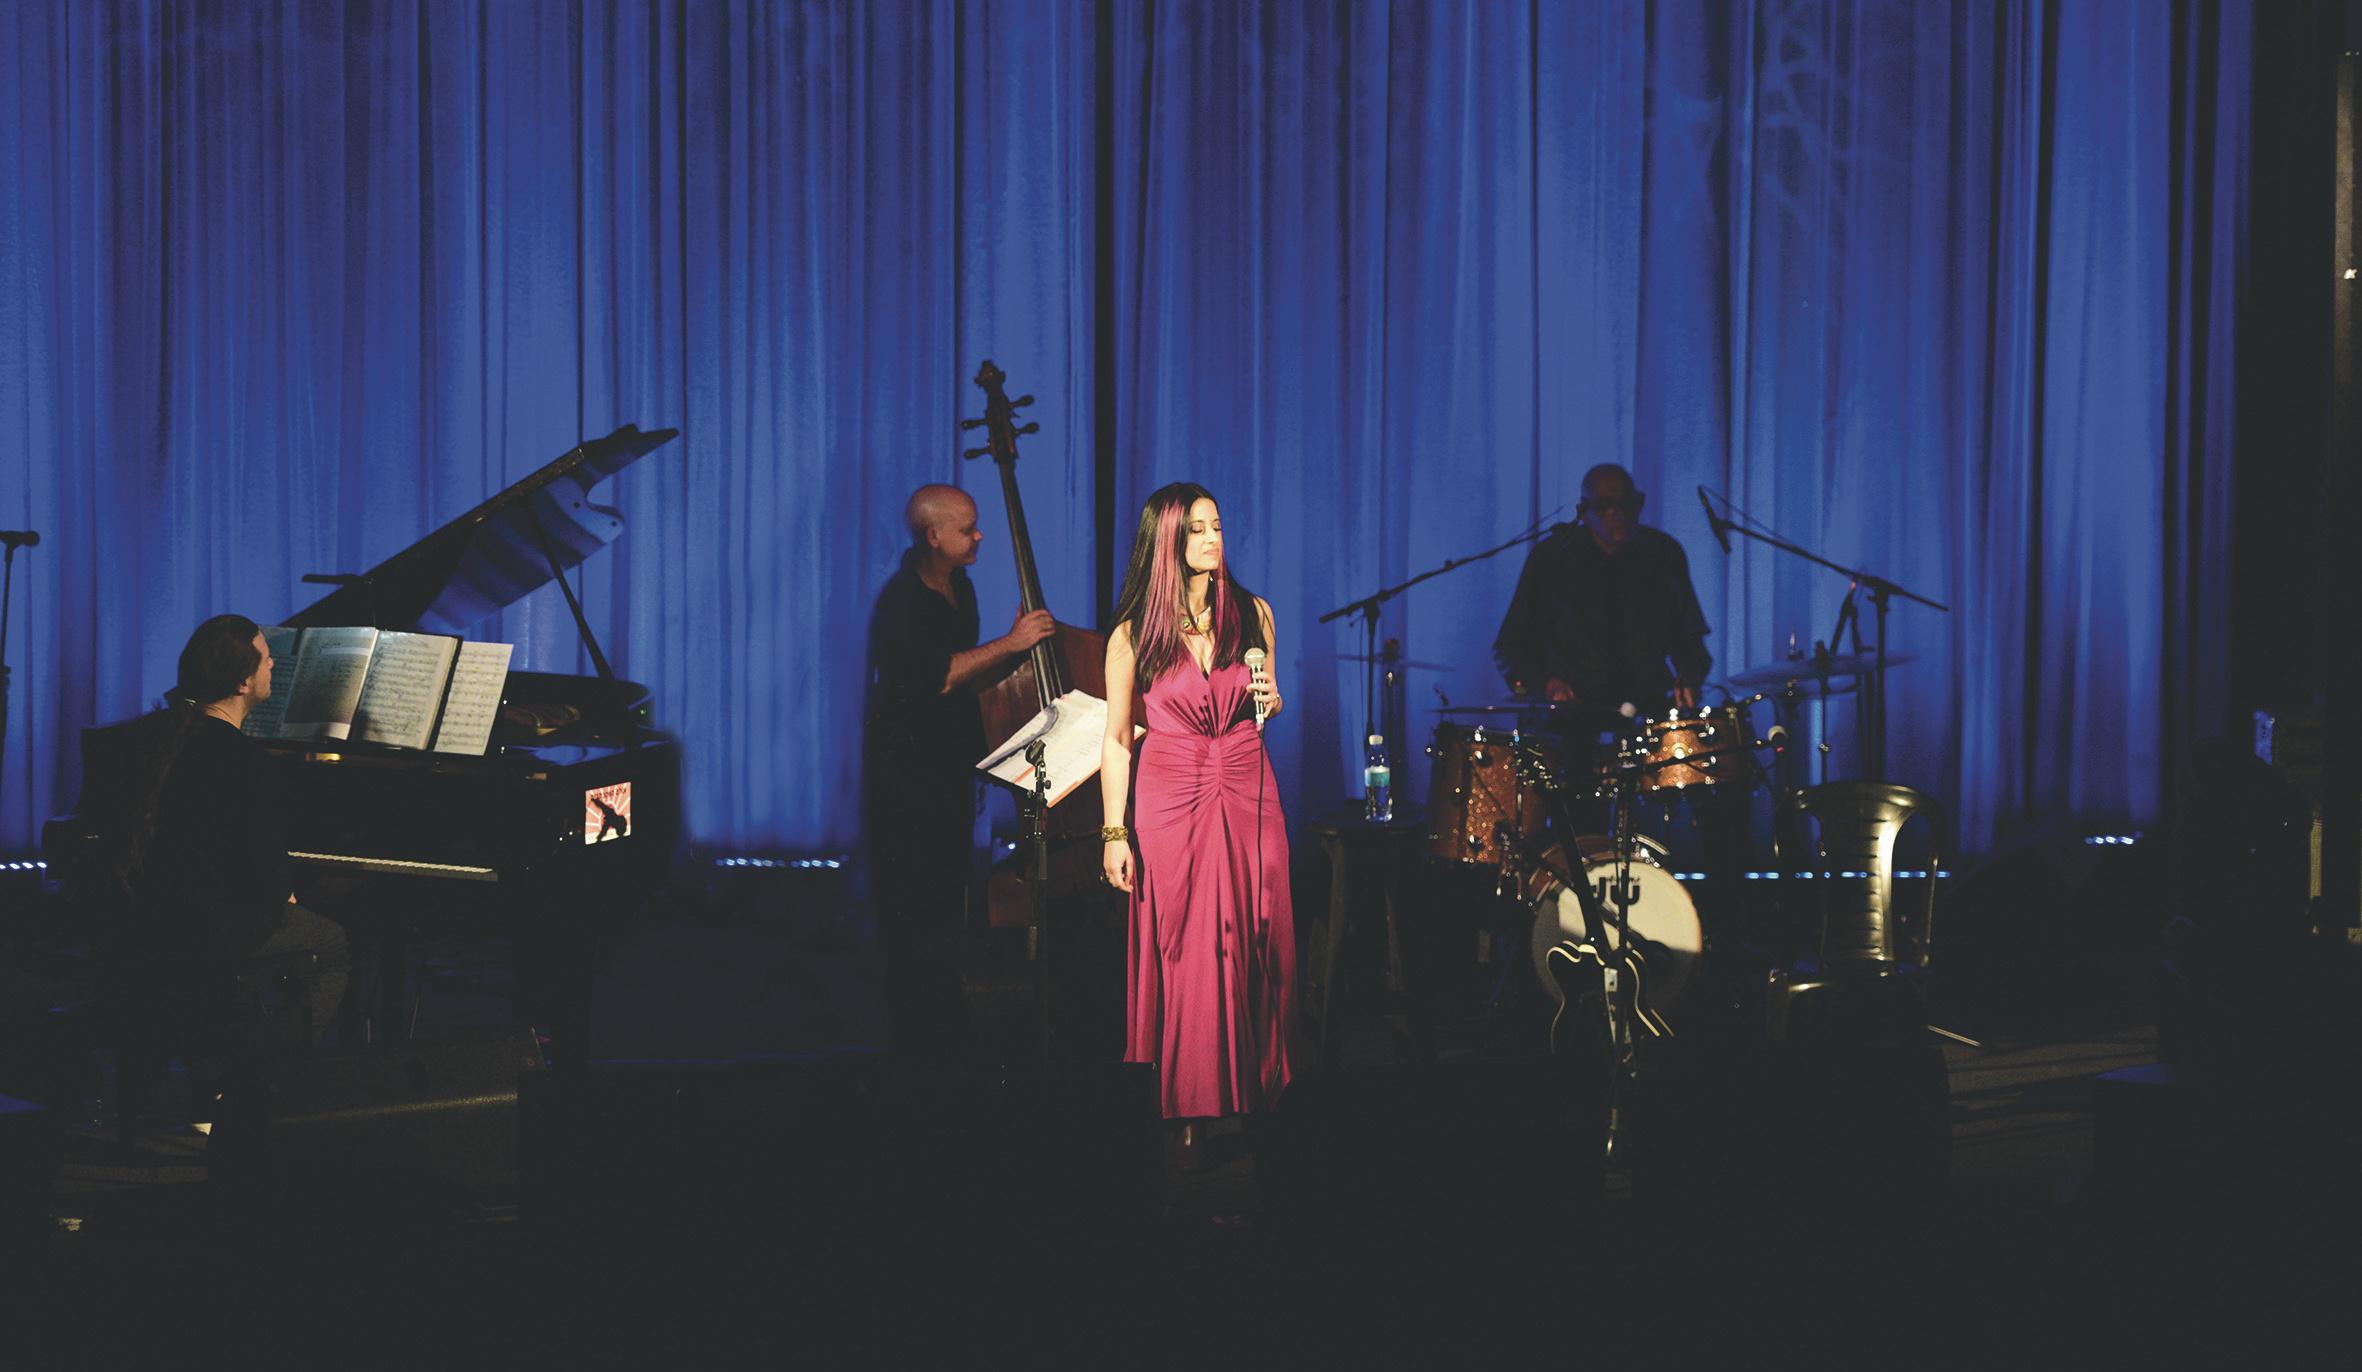 Tel Aviv Jazz Festival, Dec 2016